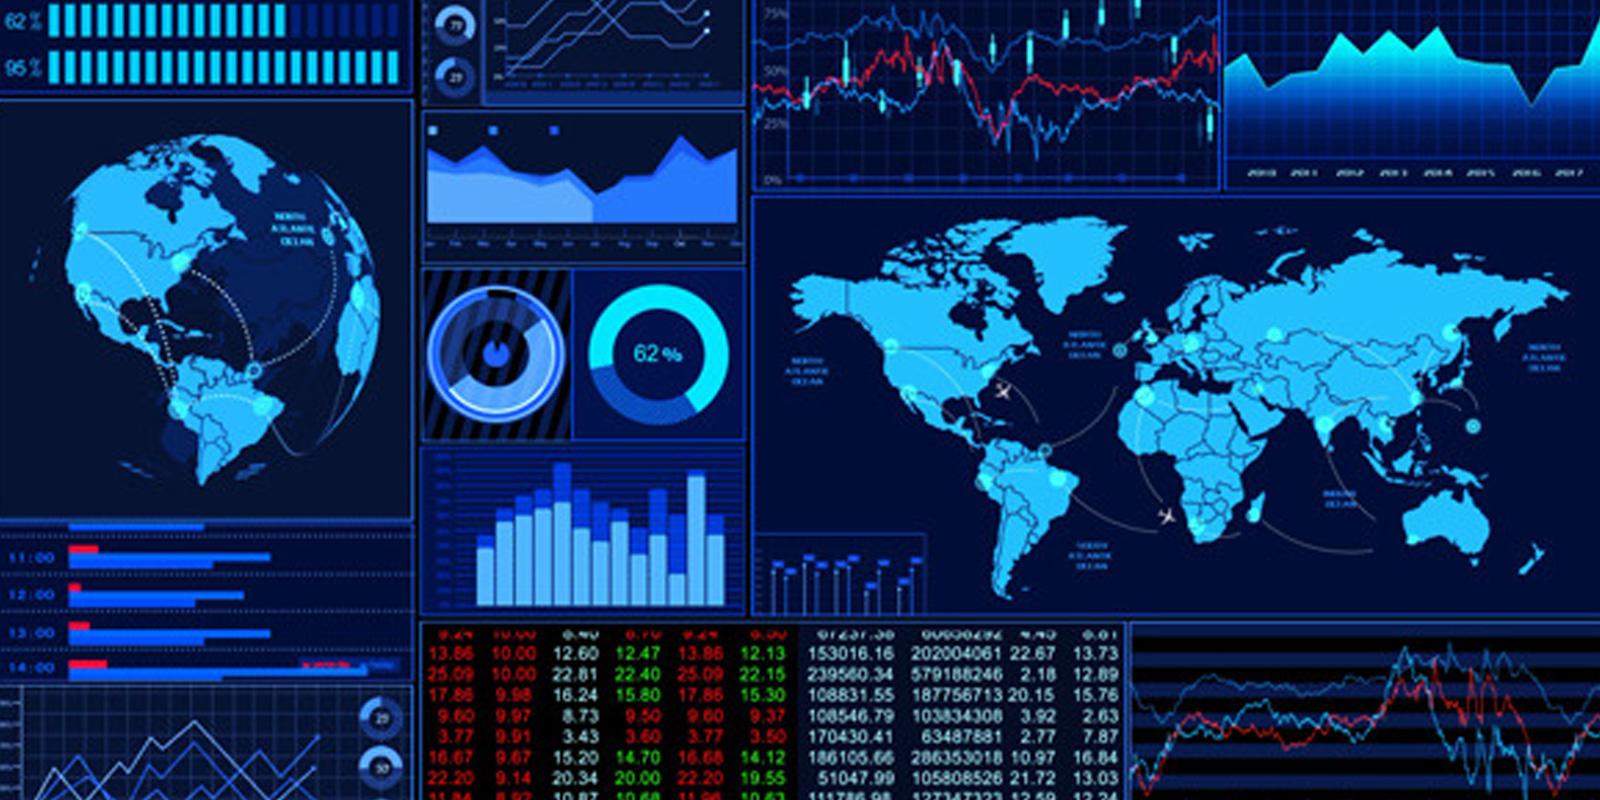 Digital Stox market